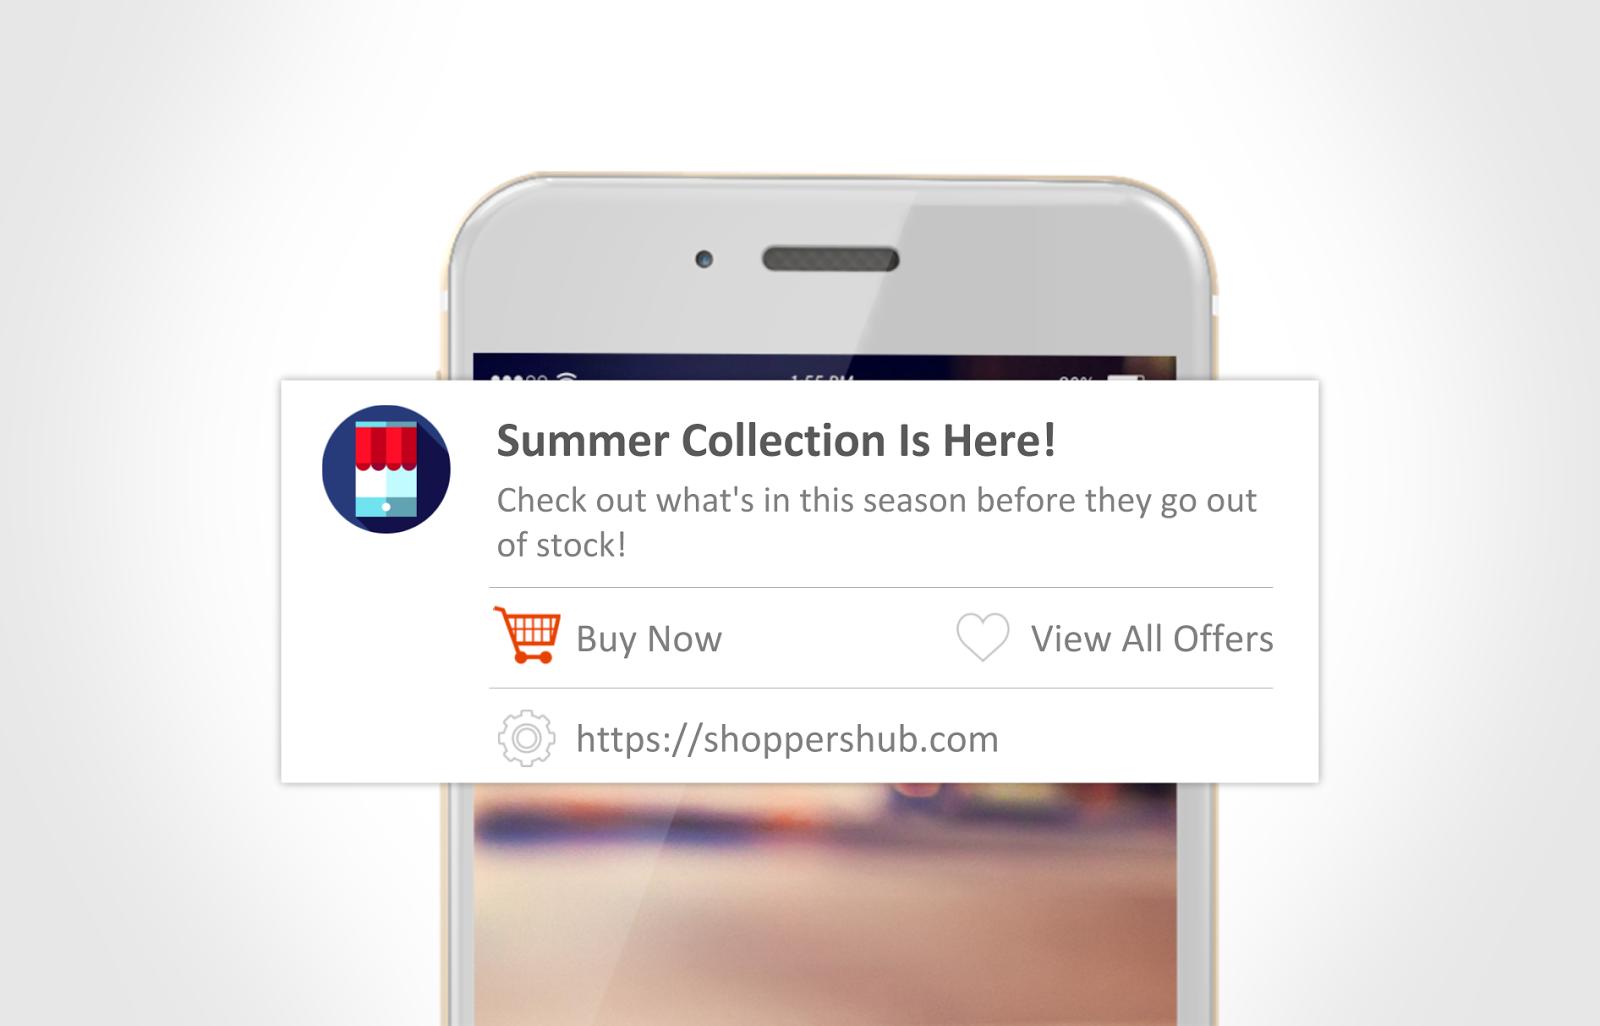 web push notifications help businesses